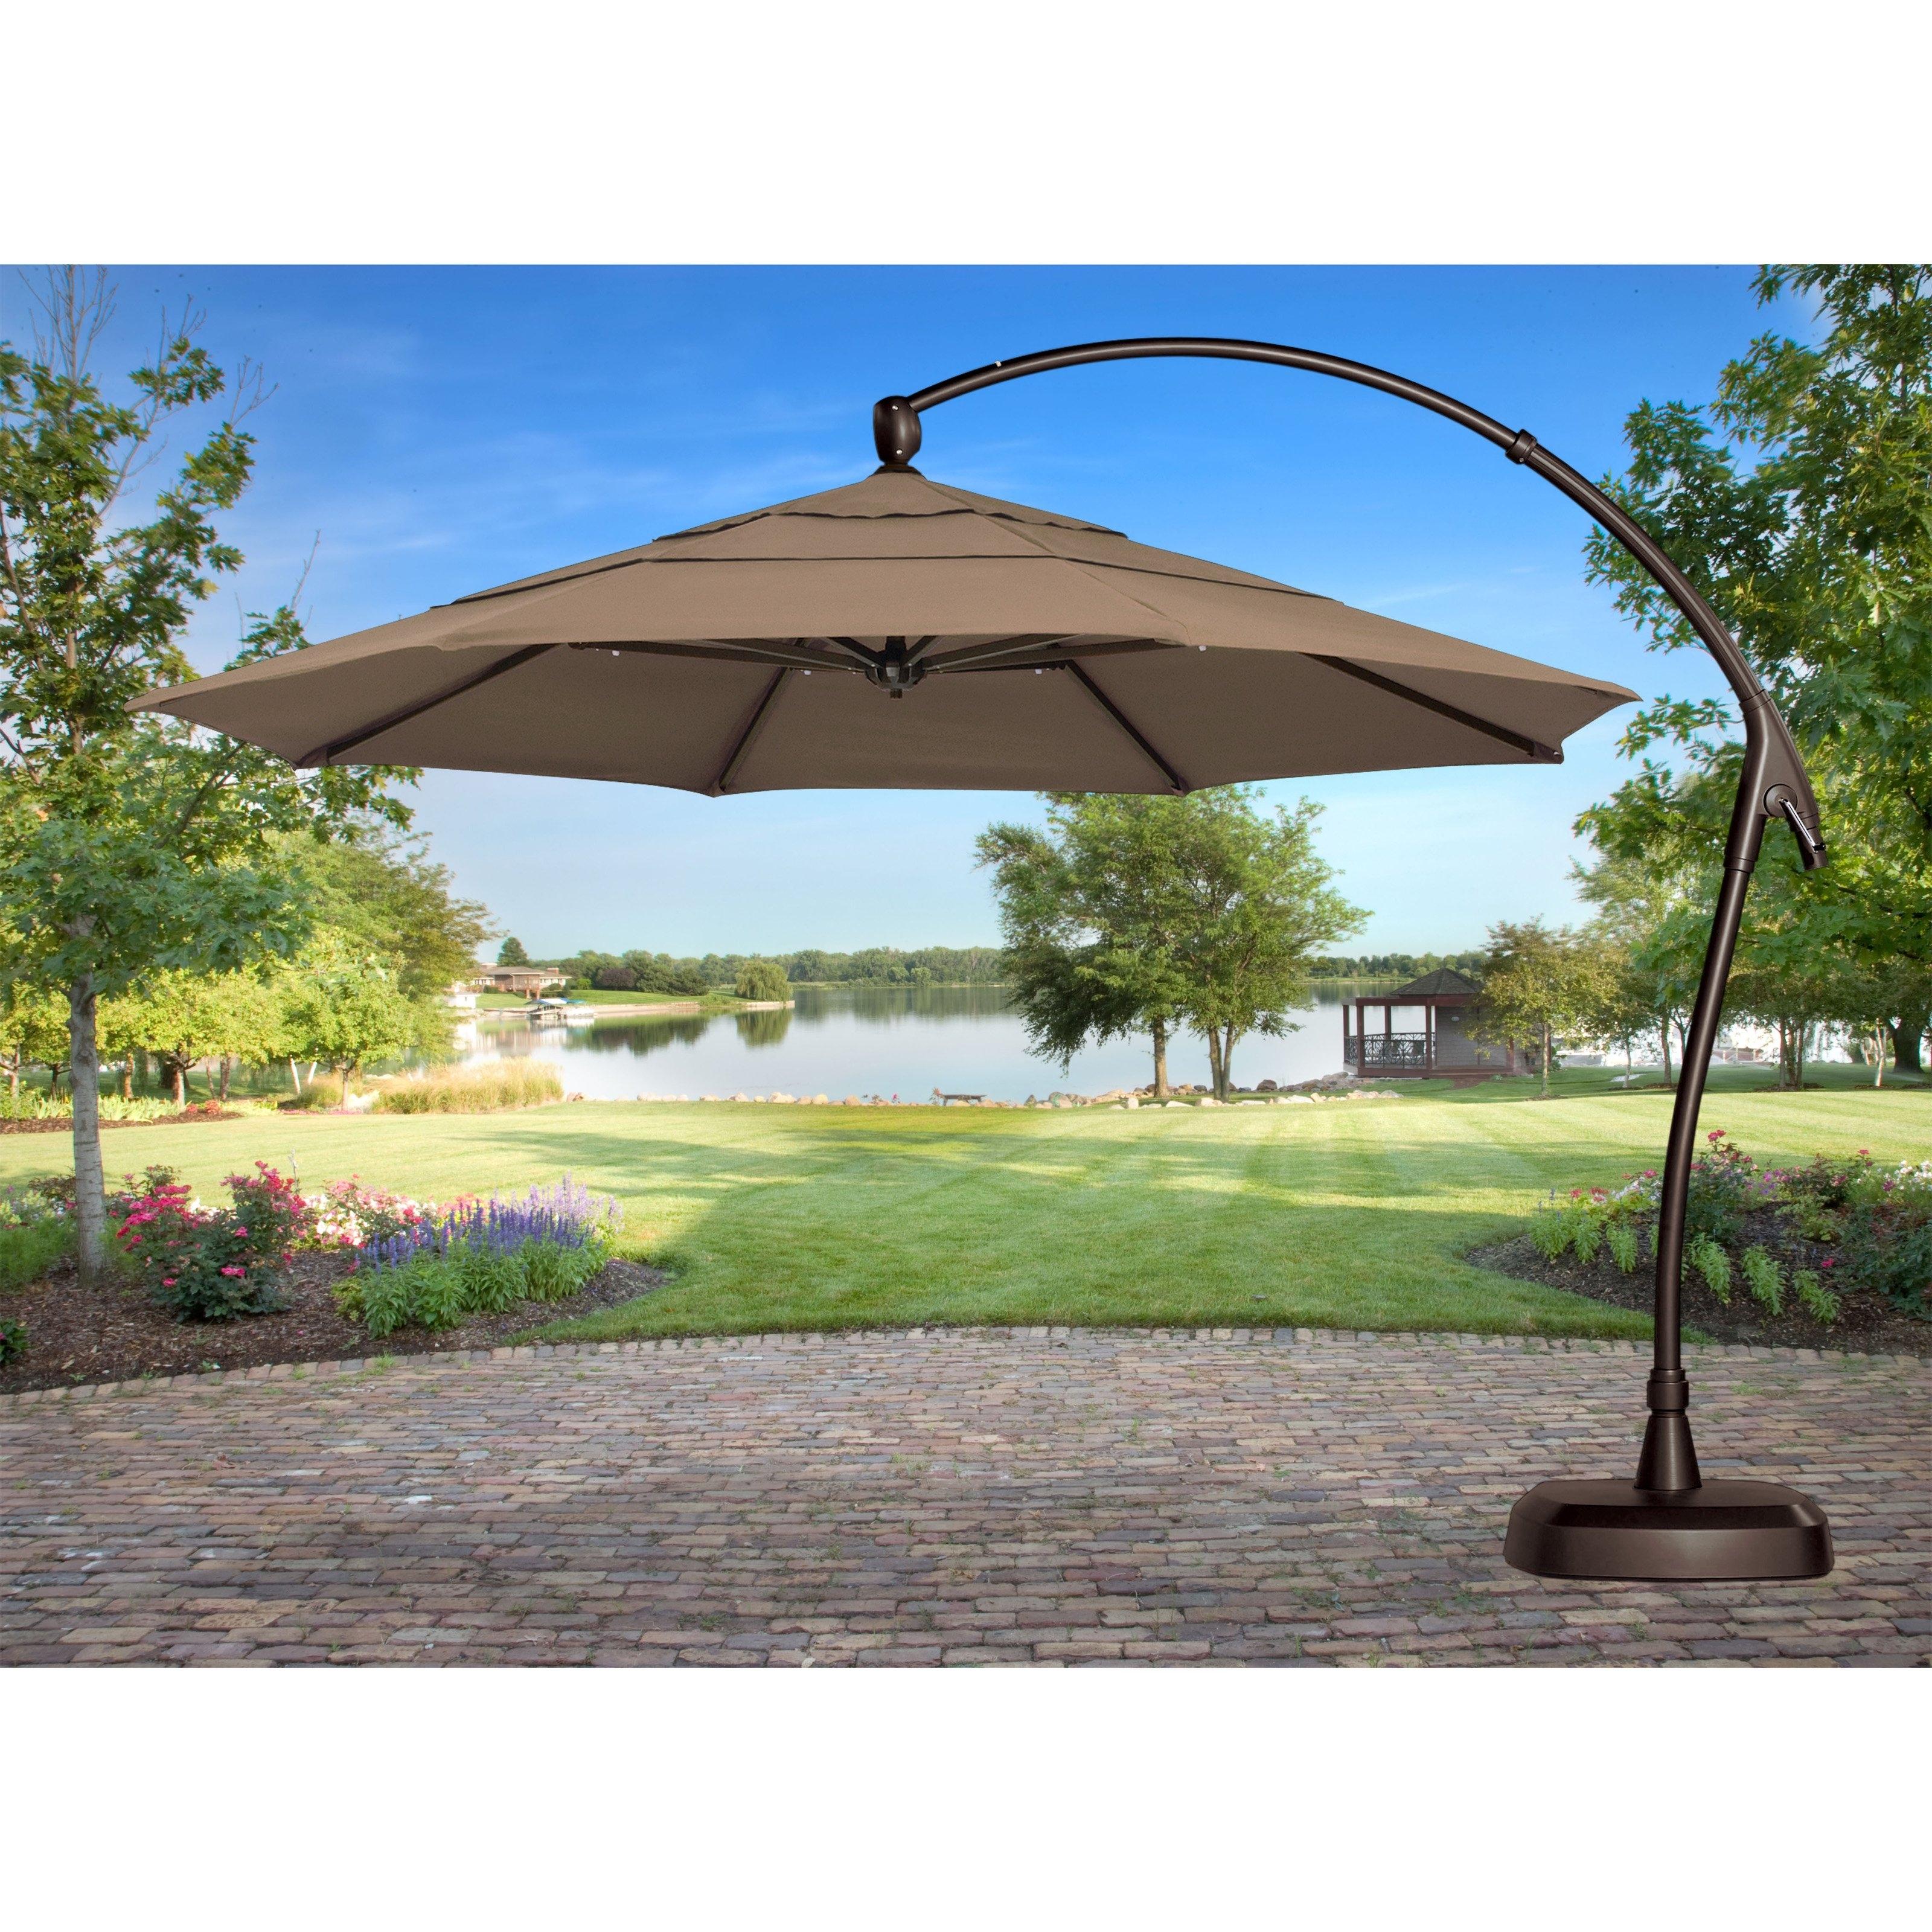 Favorite Furniture: Costco Cantilever Umbrella For Most Dramatic Shade In Patio Umbrellas At Costco (View 4 of 20)